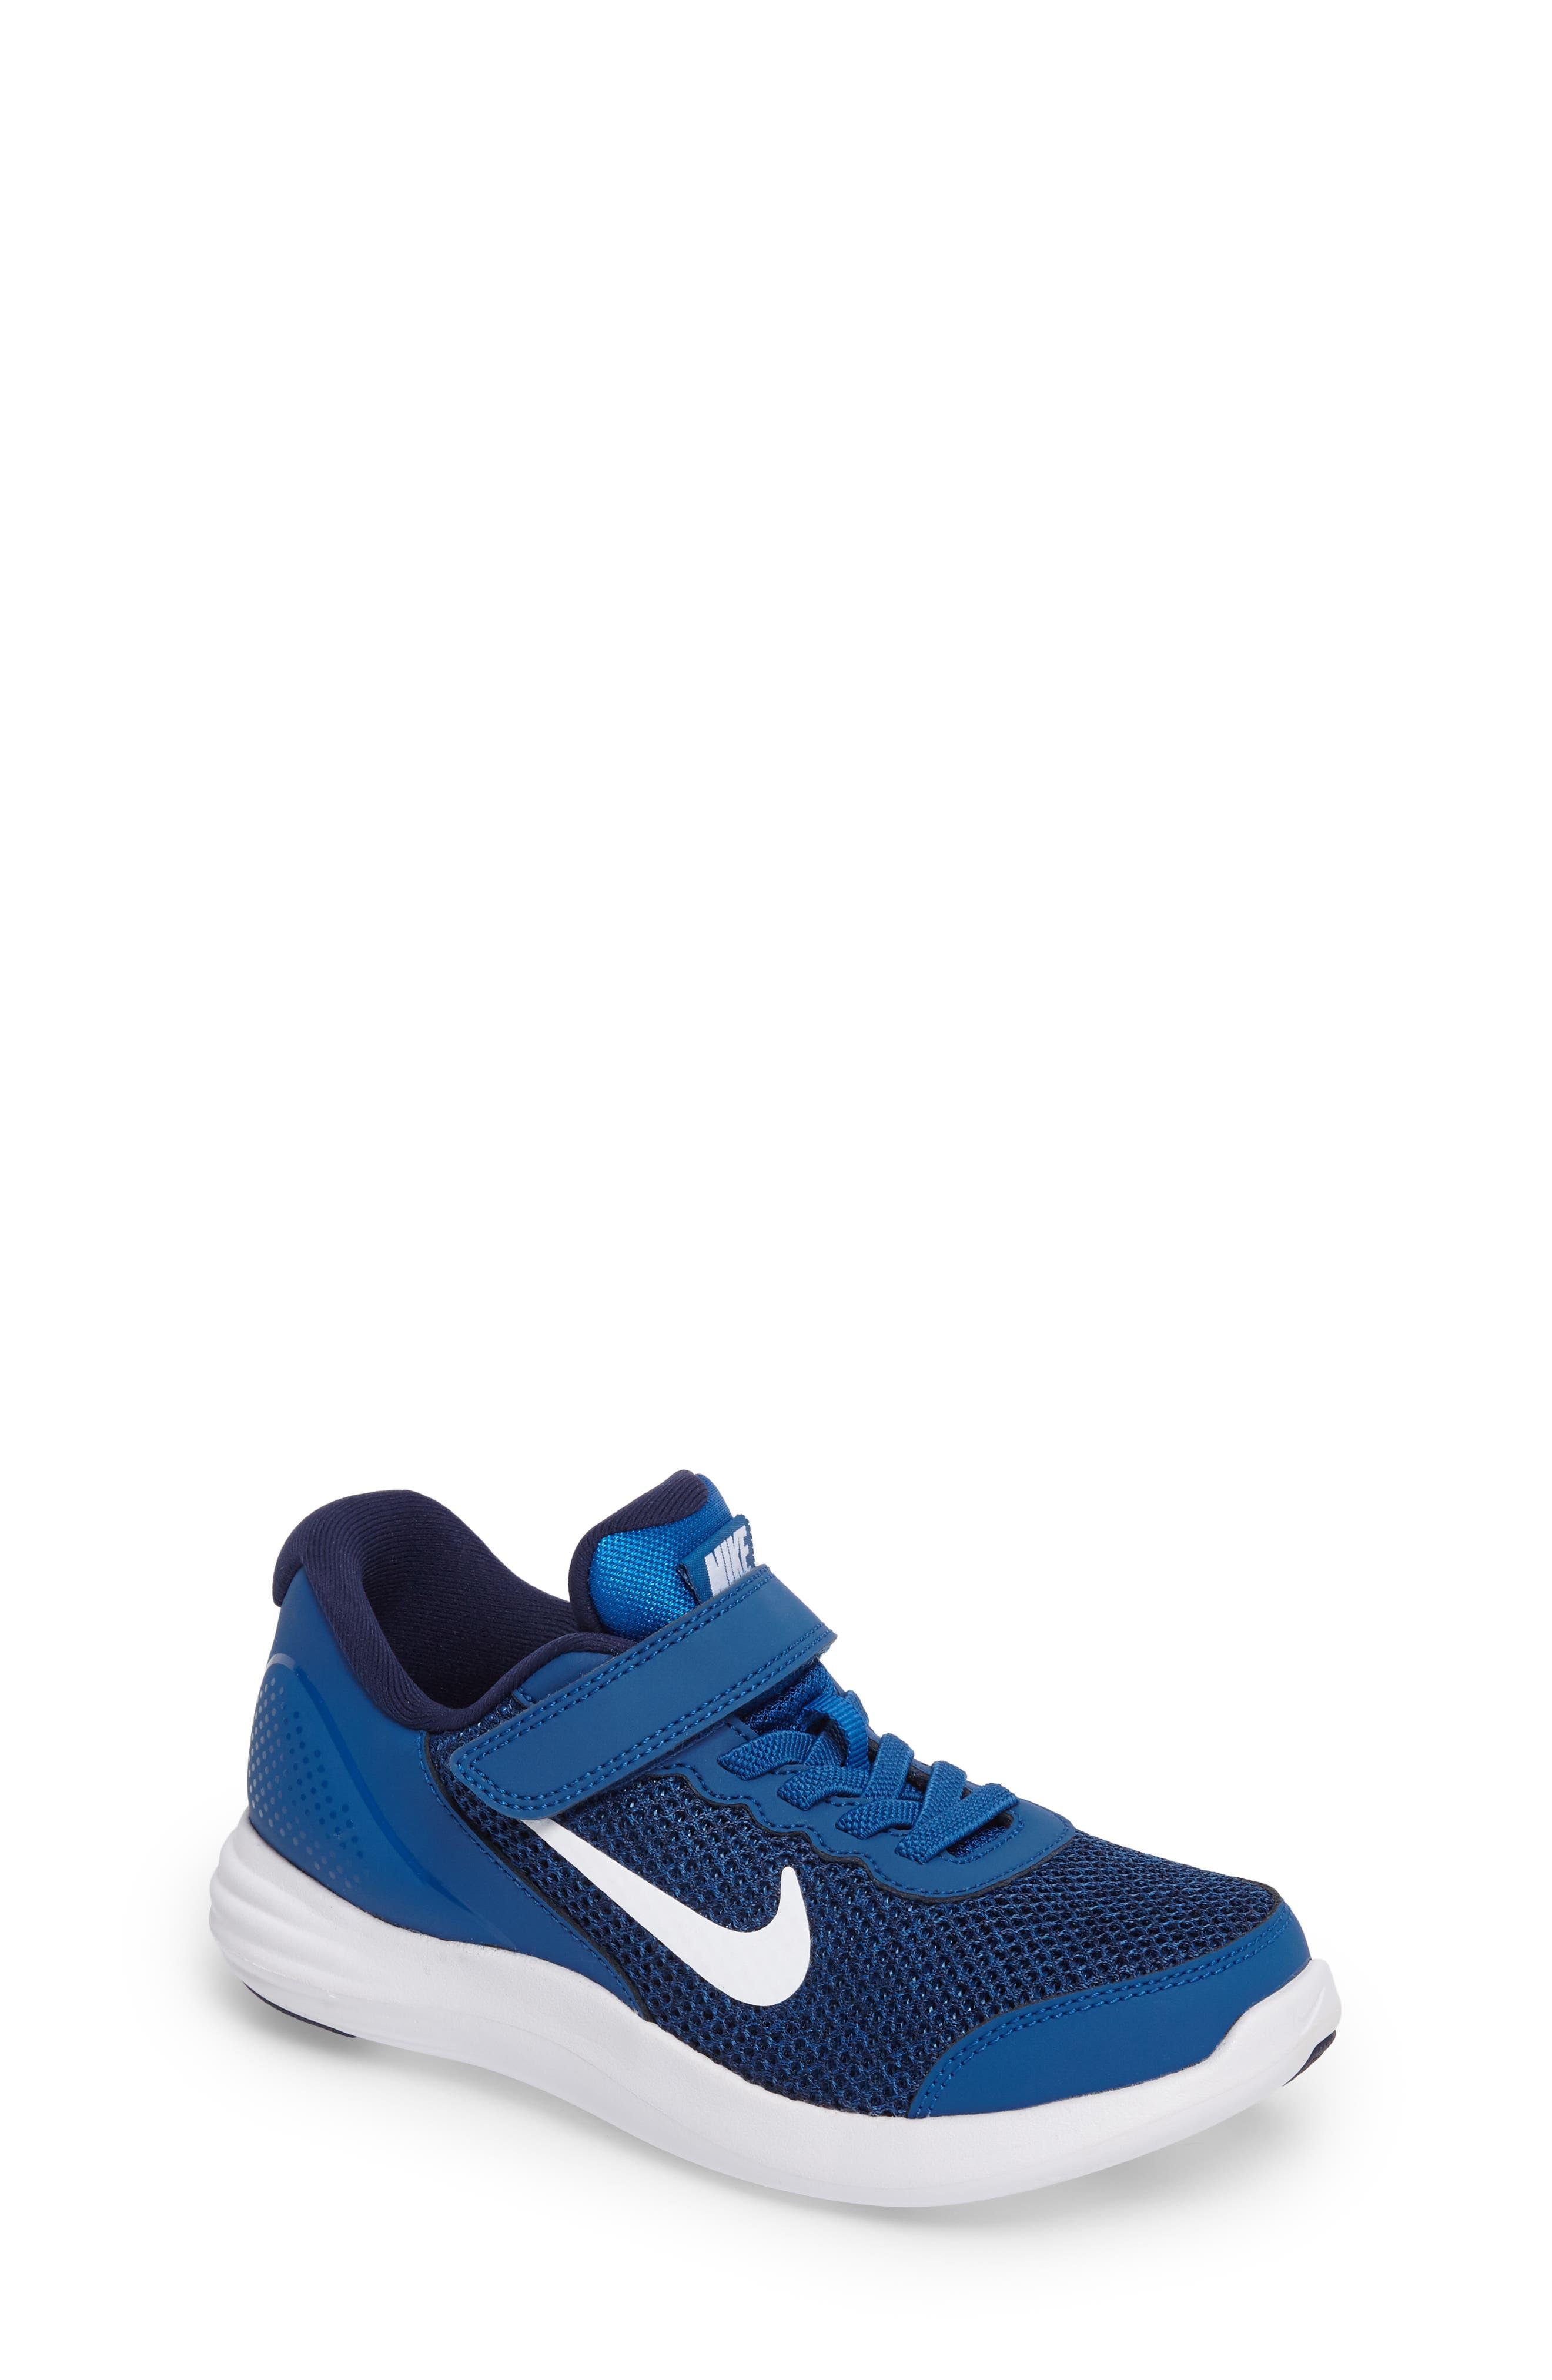 Lunar Apparent Sneaker,                             Main thumbnail 1, color,                             Blue Jay/ White/ Binary Blue